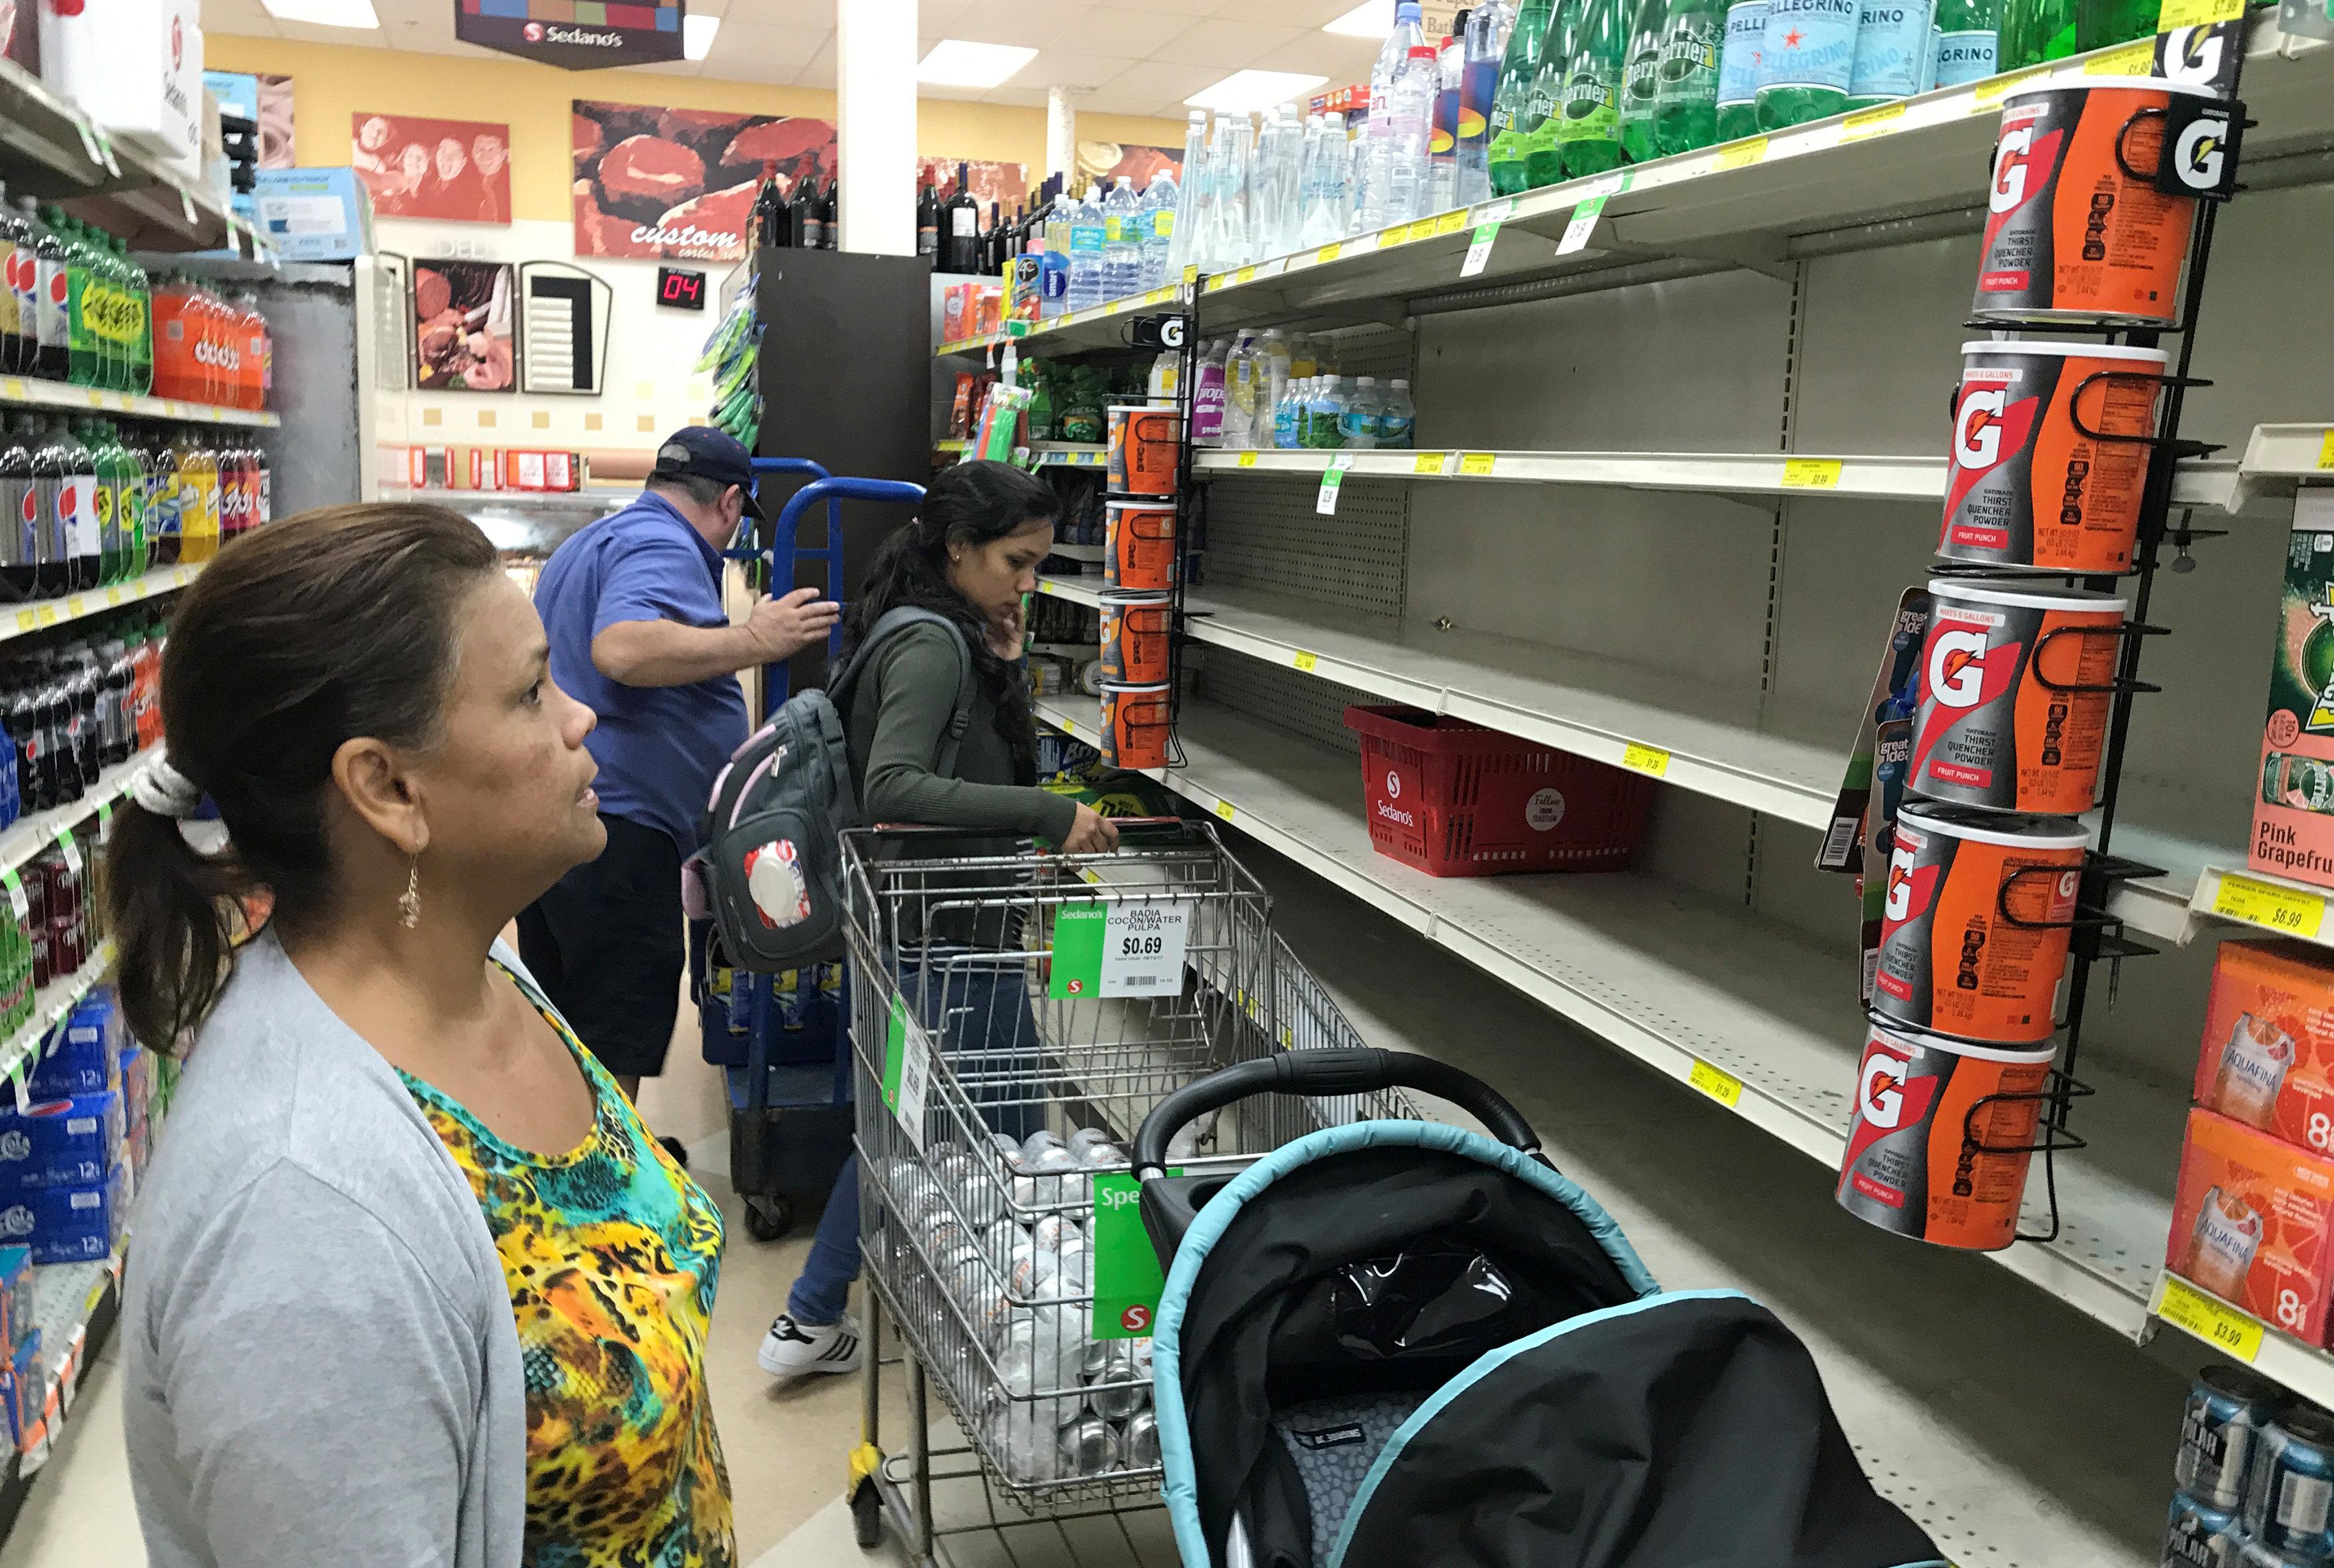 A shopper in Sedano's Supermarket looks at nearly empty water shelves in the Little Havana neighborhood in Miami, Florida on Sept. 5, 2017.  (REUTERS/Joe Skipper)